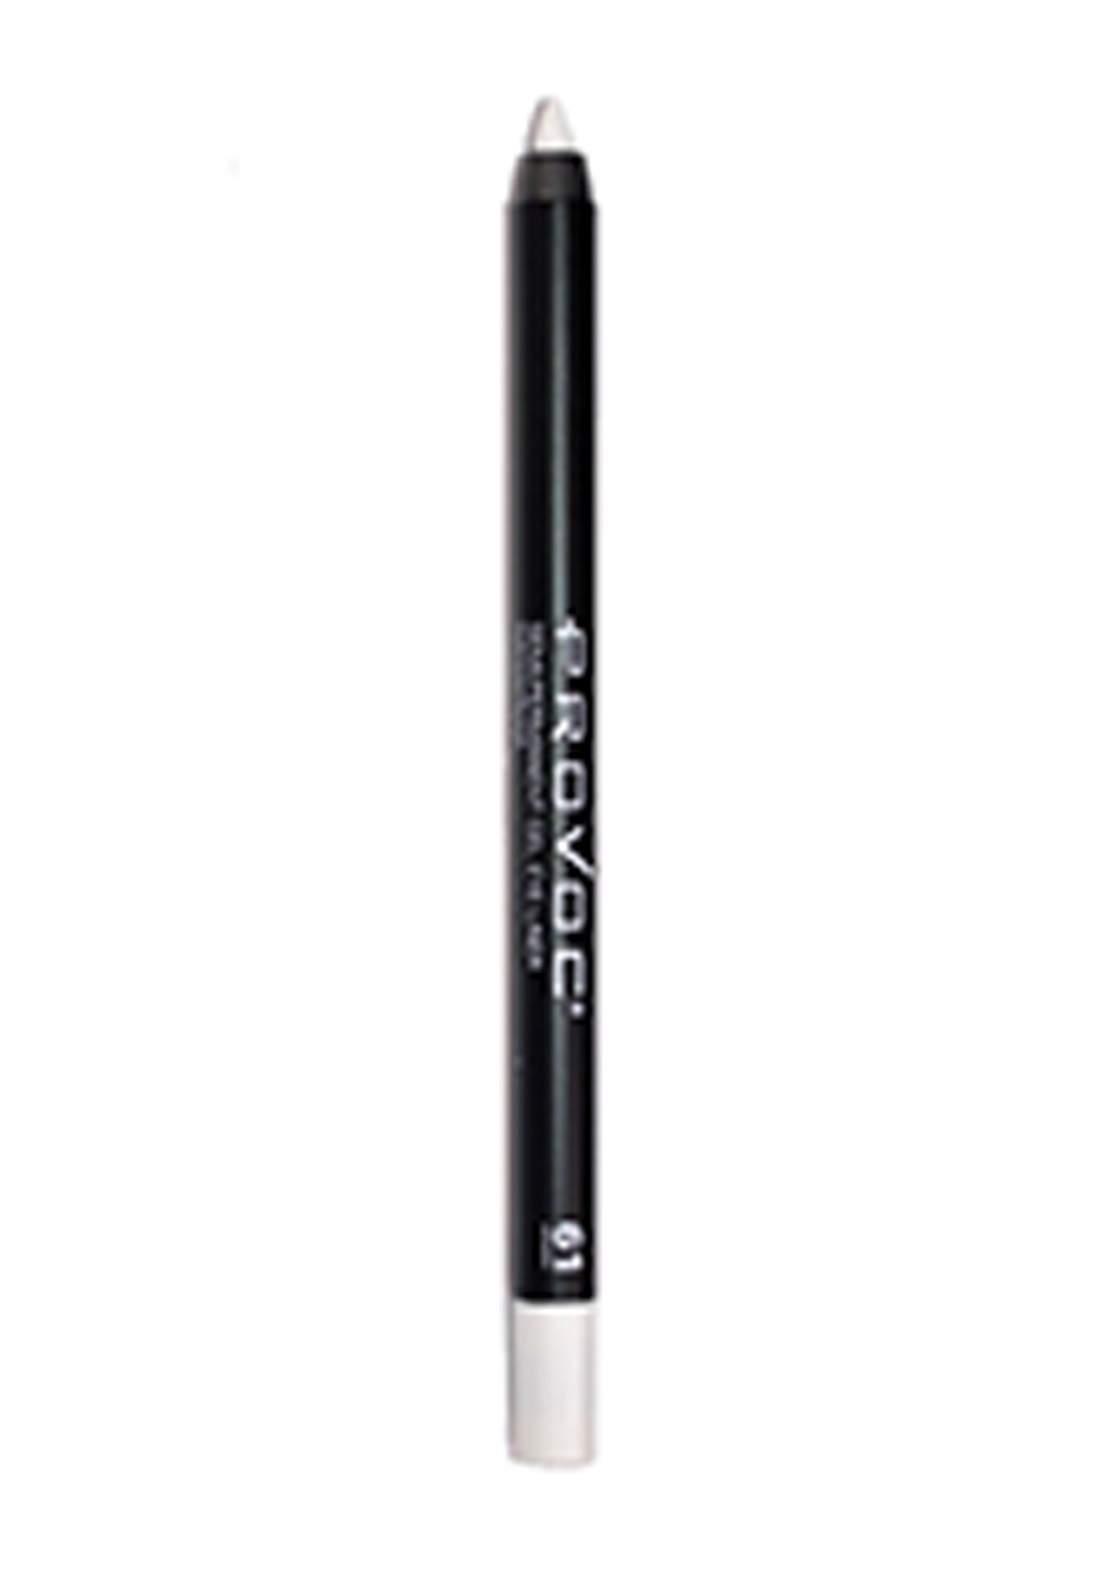 Provoc 353-0062 Semi-Permanent Gel Eye Liner Pencil No.61 White Hot قلم محدد العيون